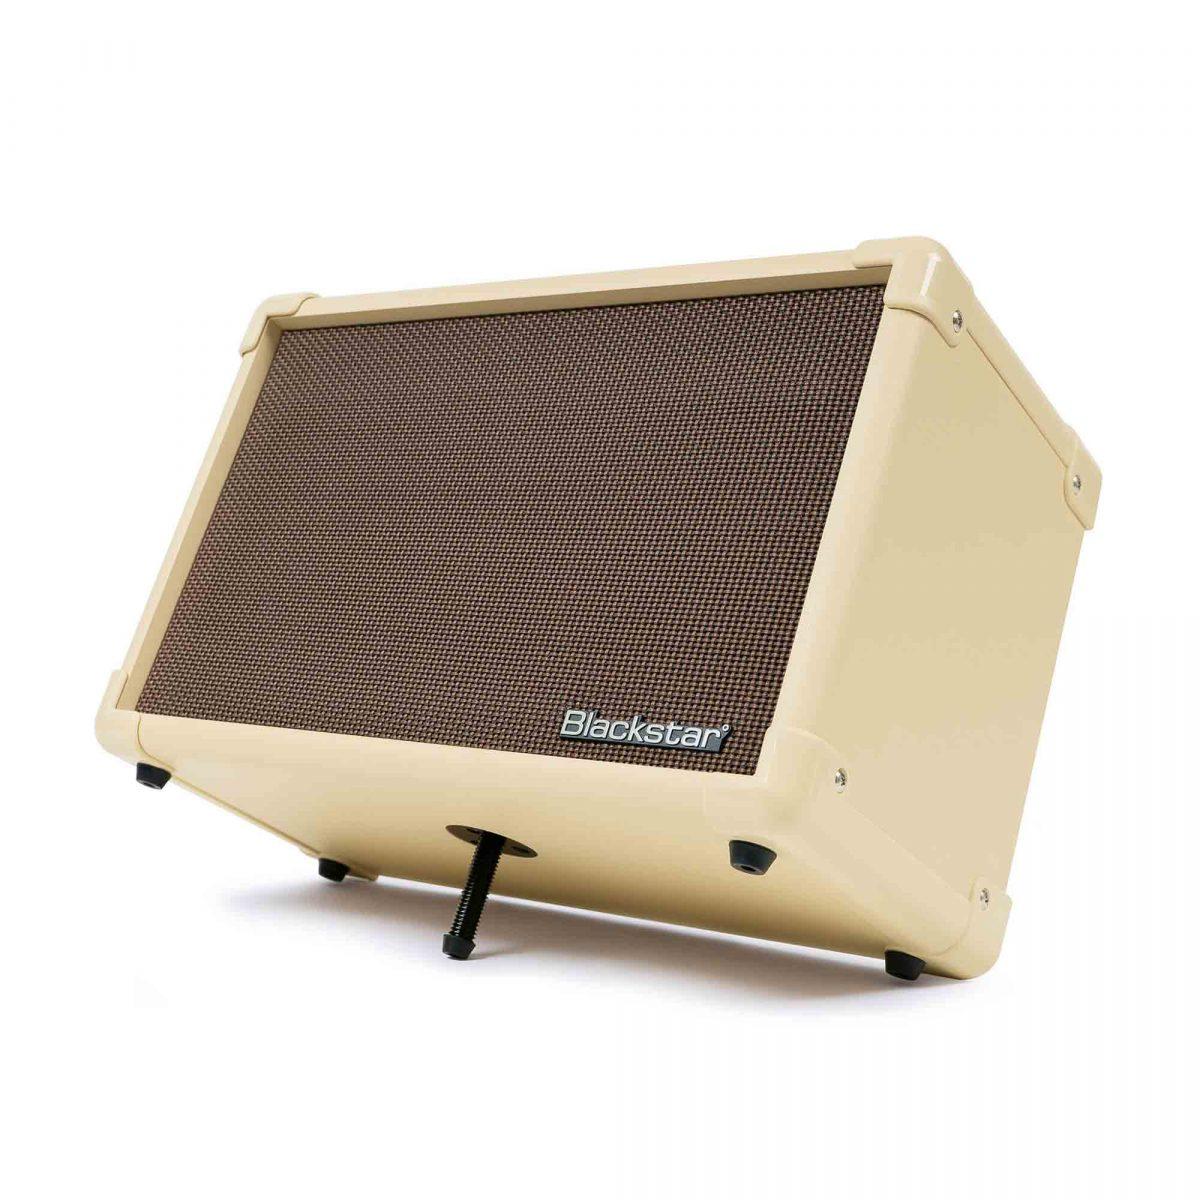 BlackStar Acoustic Core 30 right